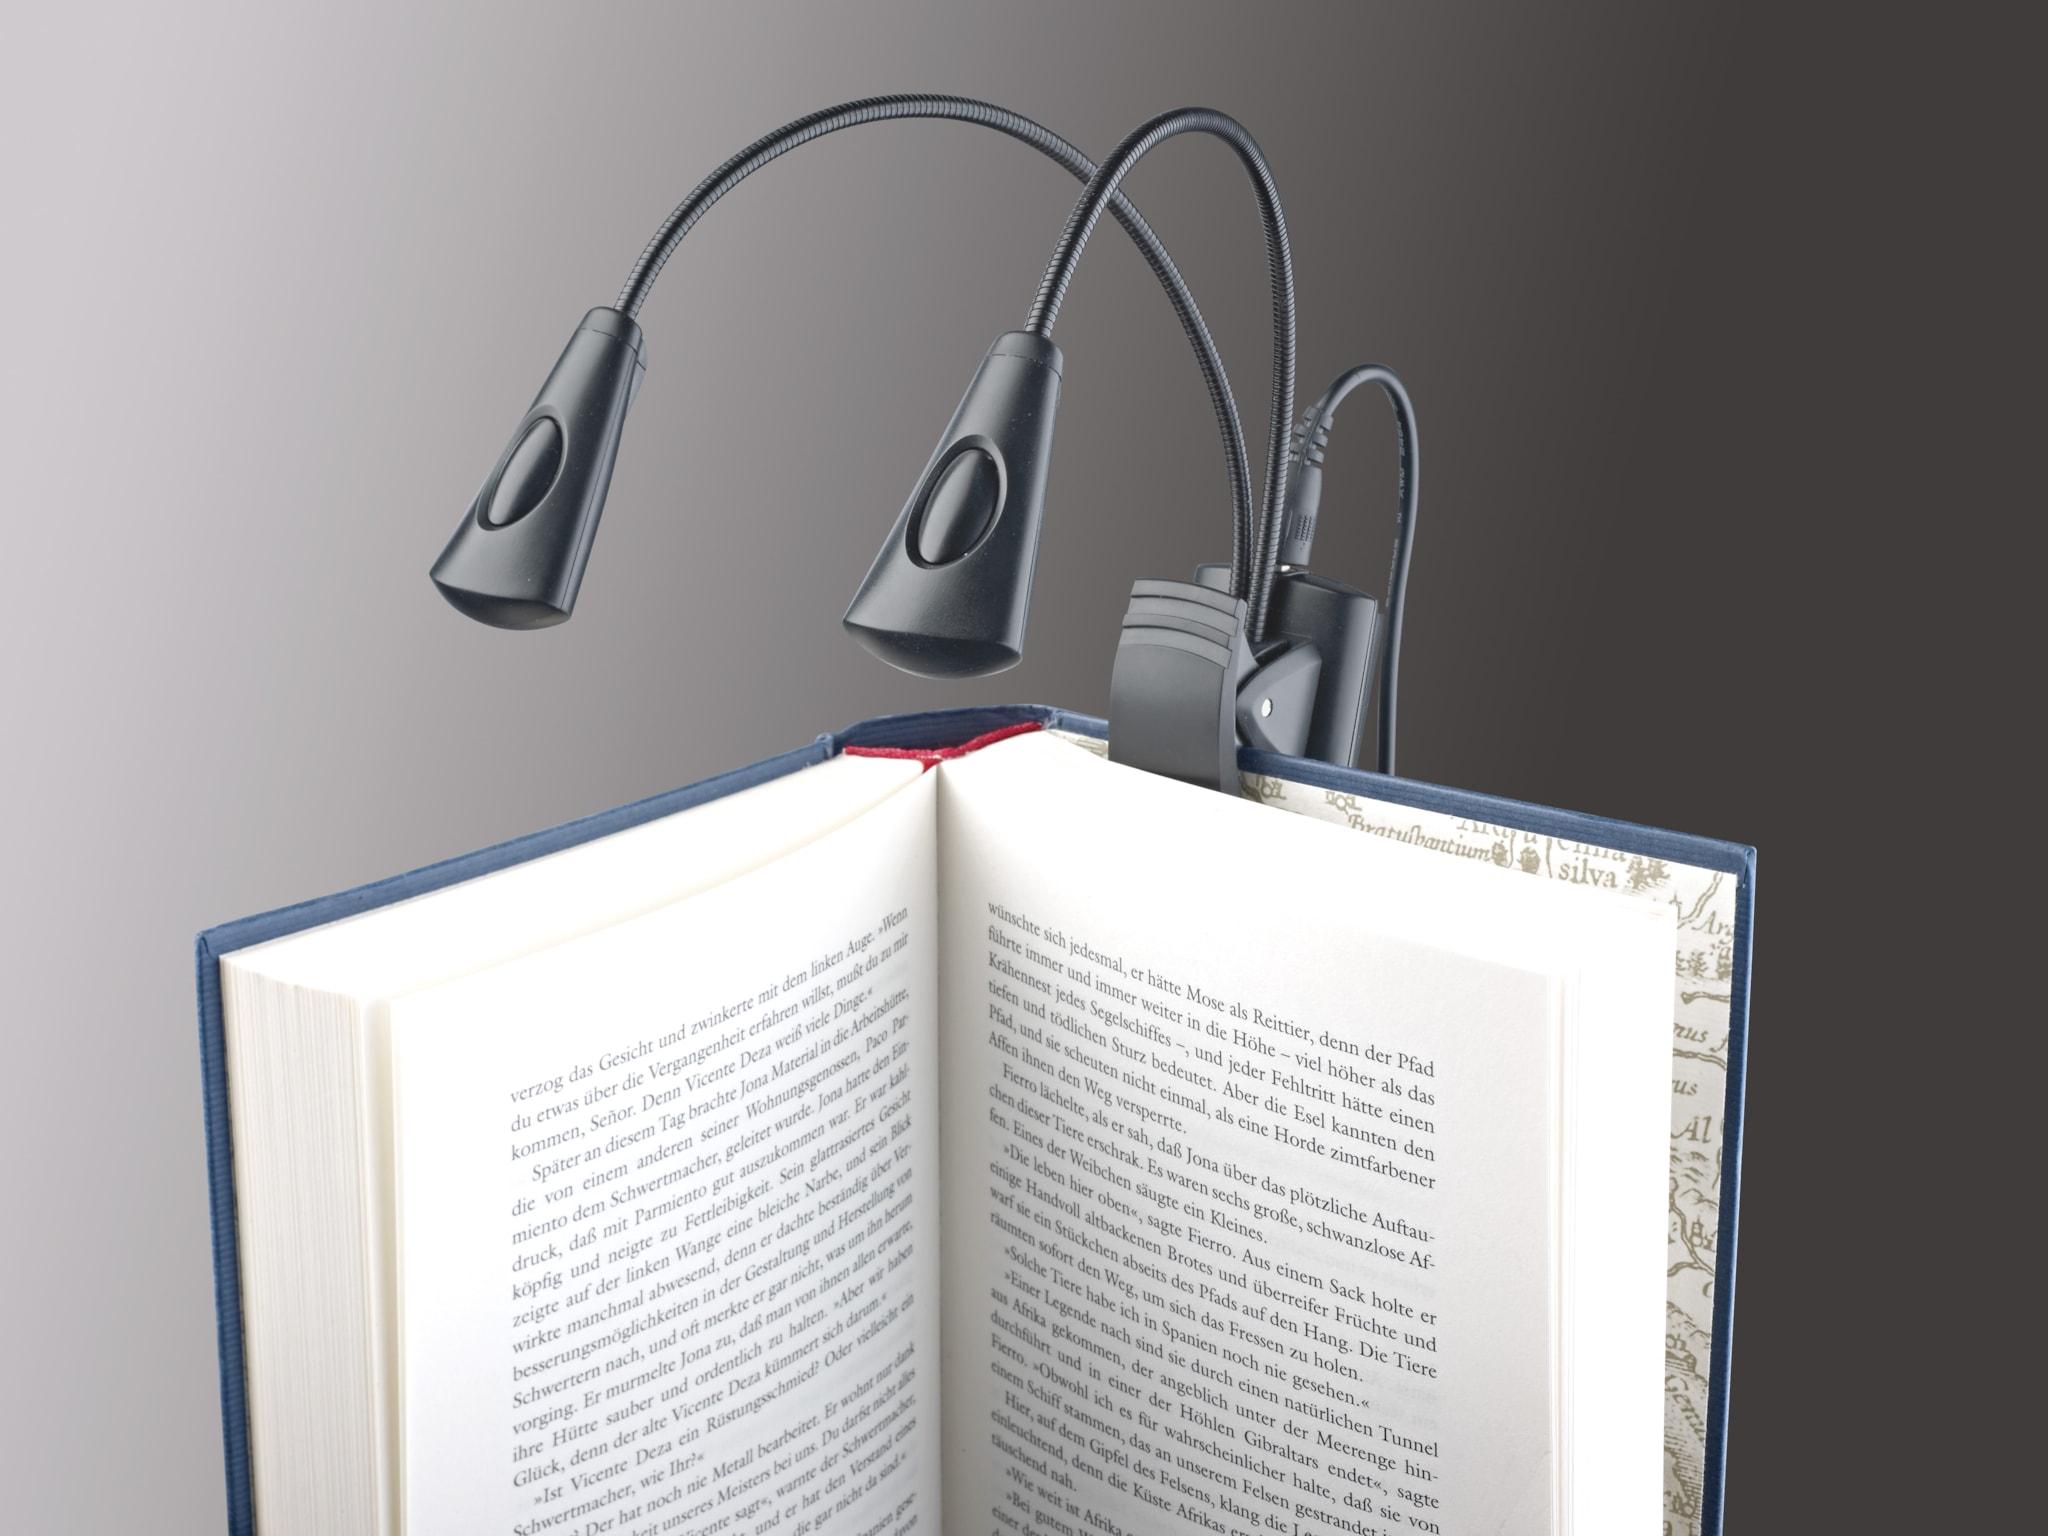 KM12245 - Music stand light »Double4 LED FlexLight« Set